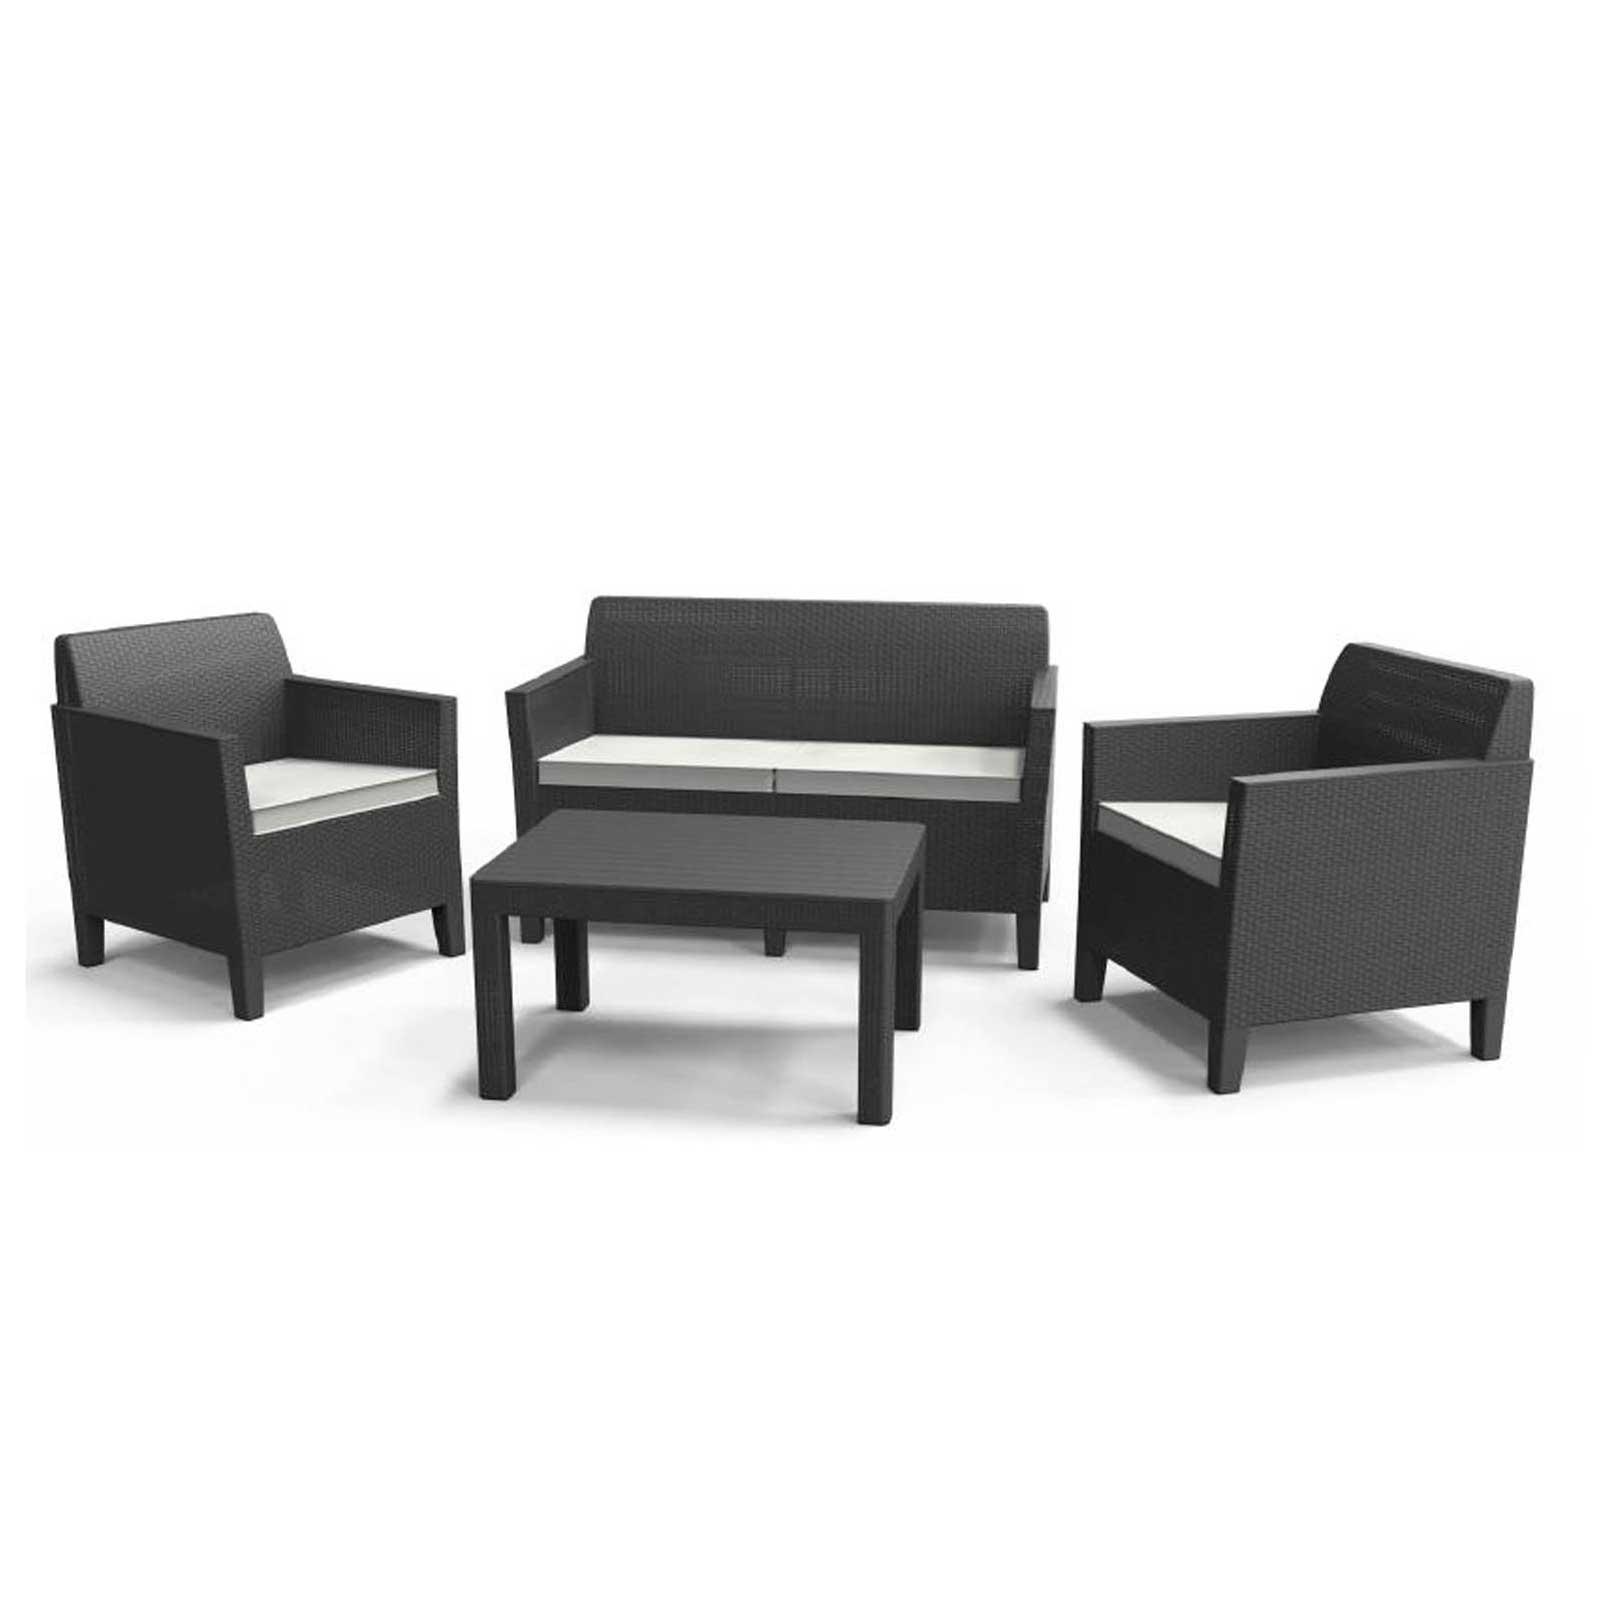 Allibert Chicago Graphite Garden Lounge Furniture Set Large Table